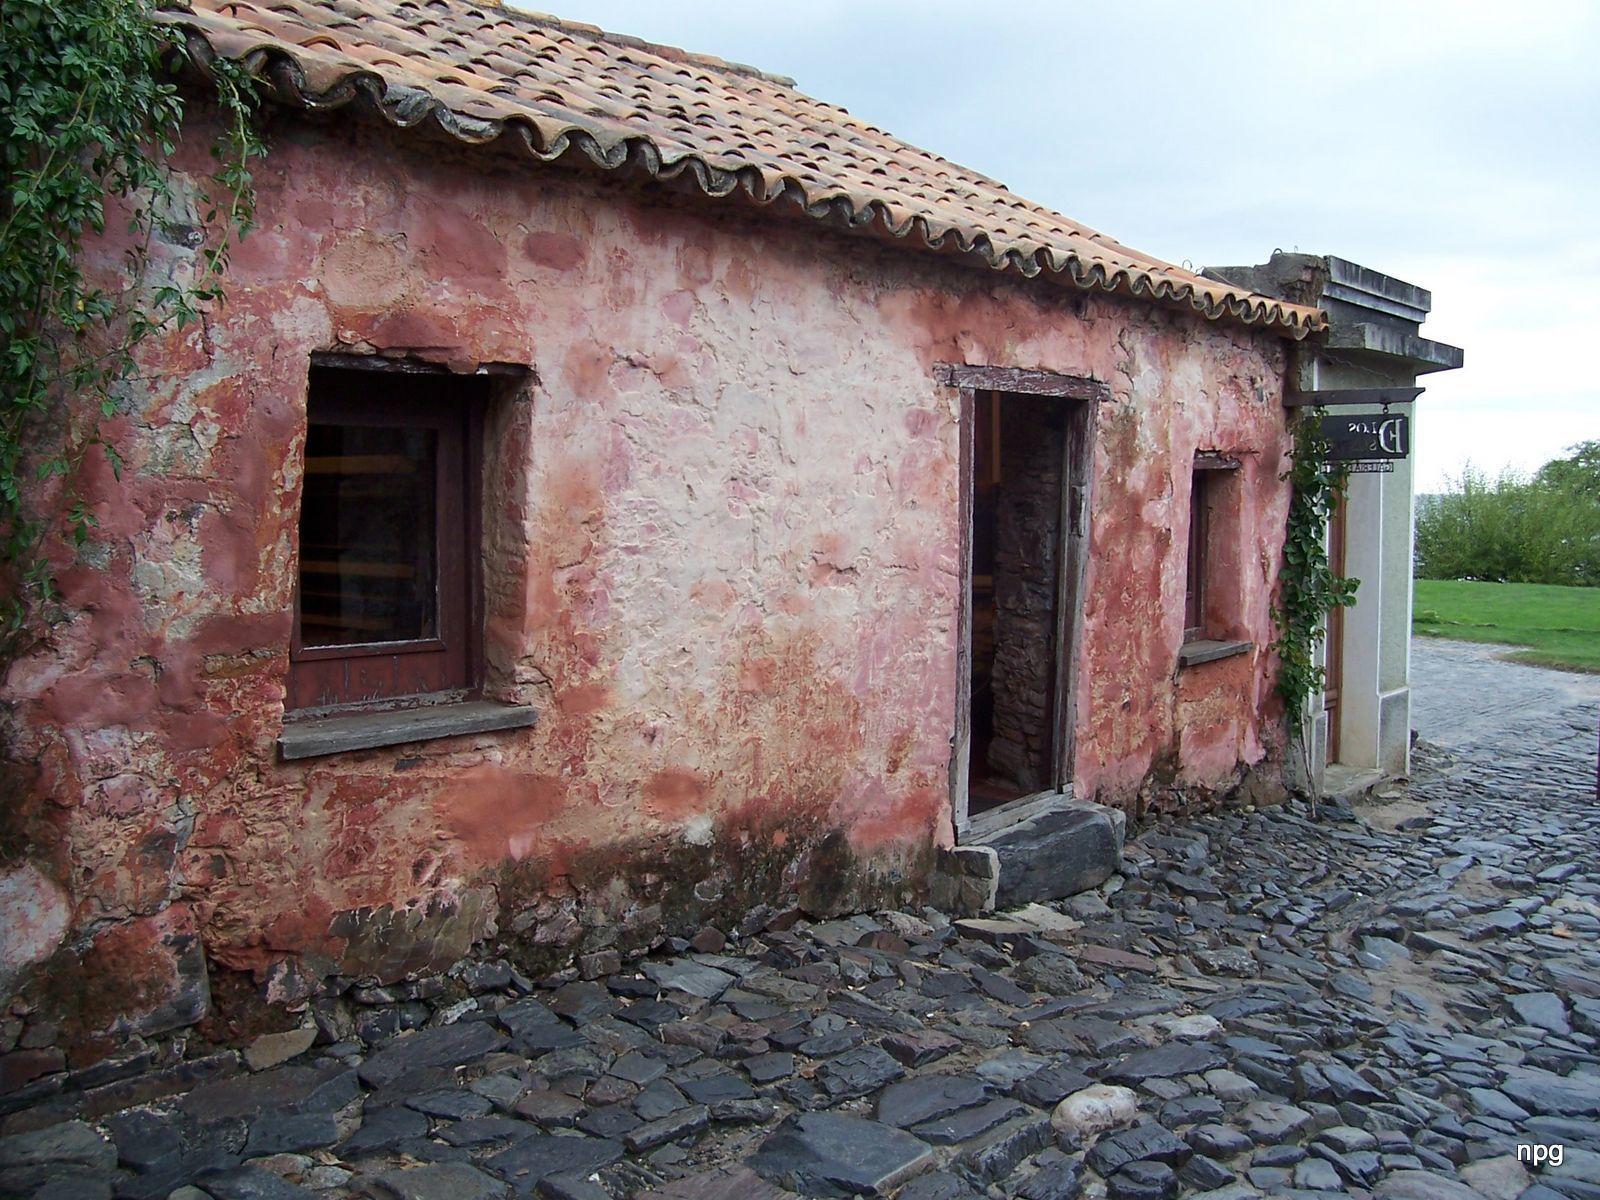 Colonia_Del_Sacramento,_Uruguay_-_panoramio_(1).jpg